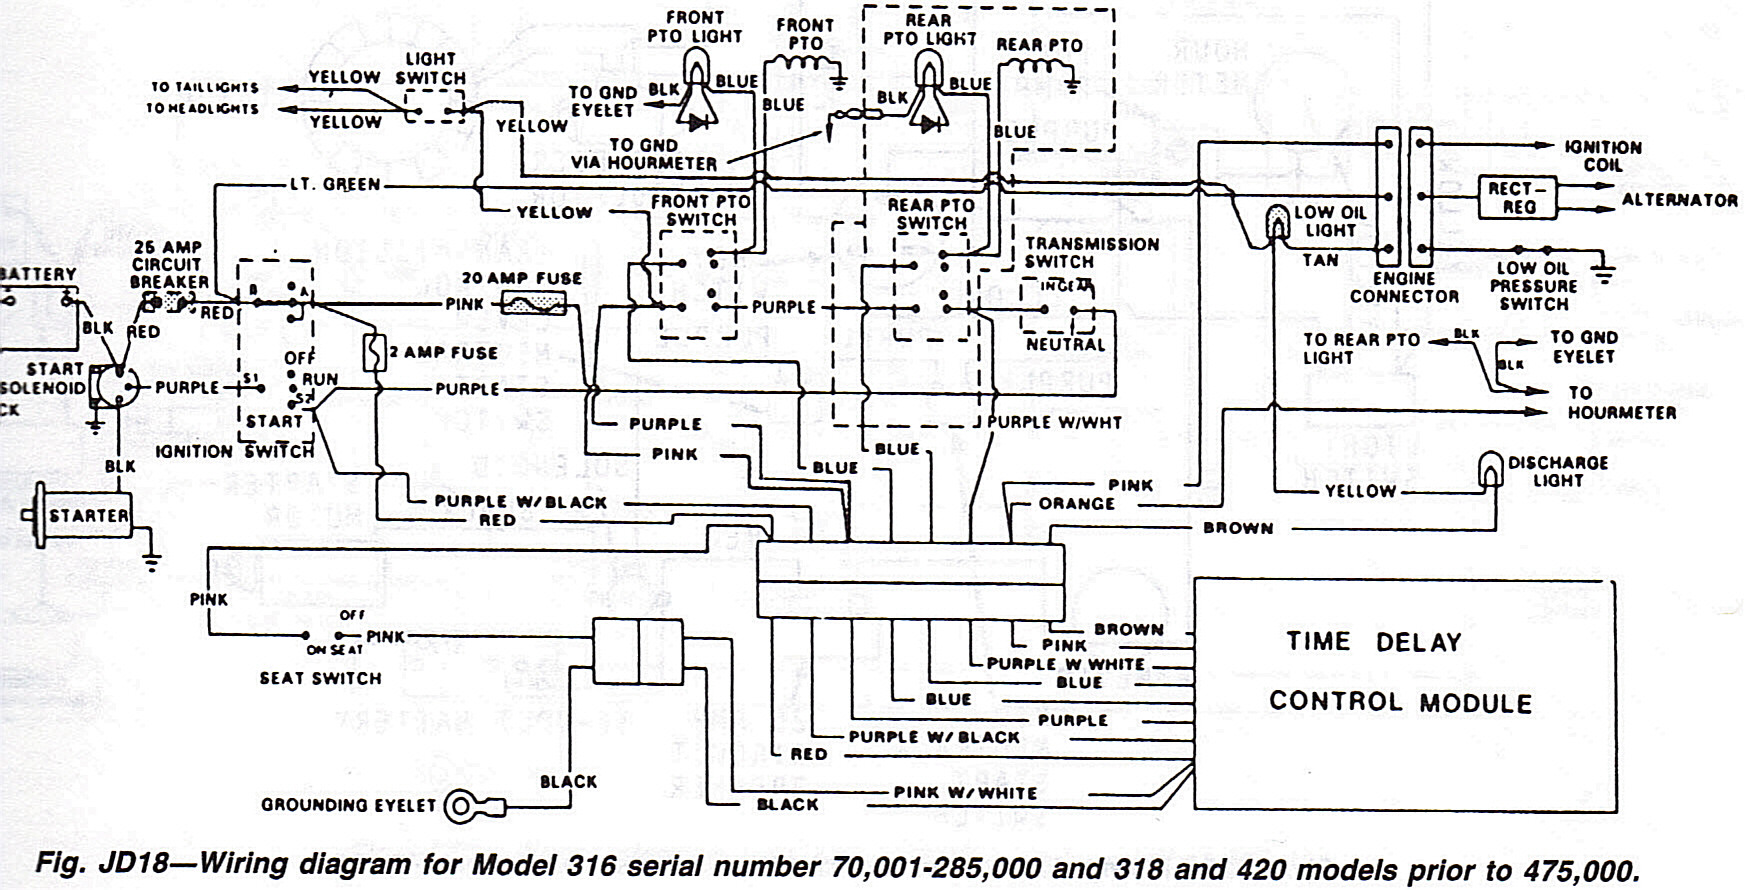 John Deere Gx75 Wiring Diagram Schema Electrique John Deere Gx75 Bois Eco Concept Fr